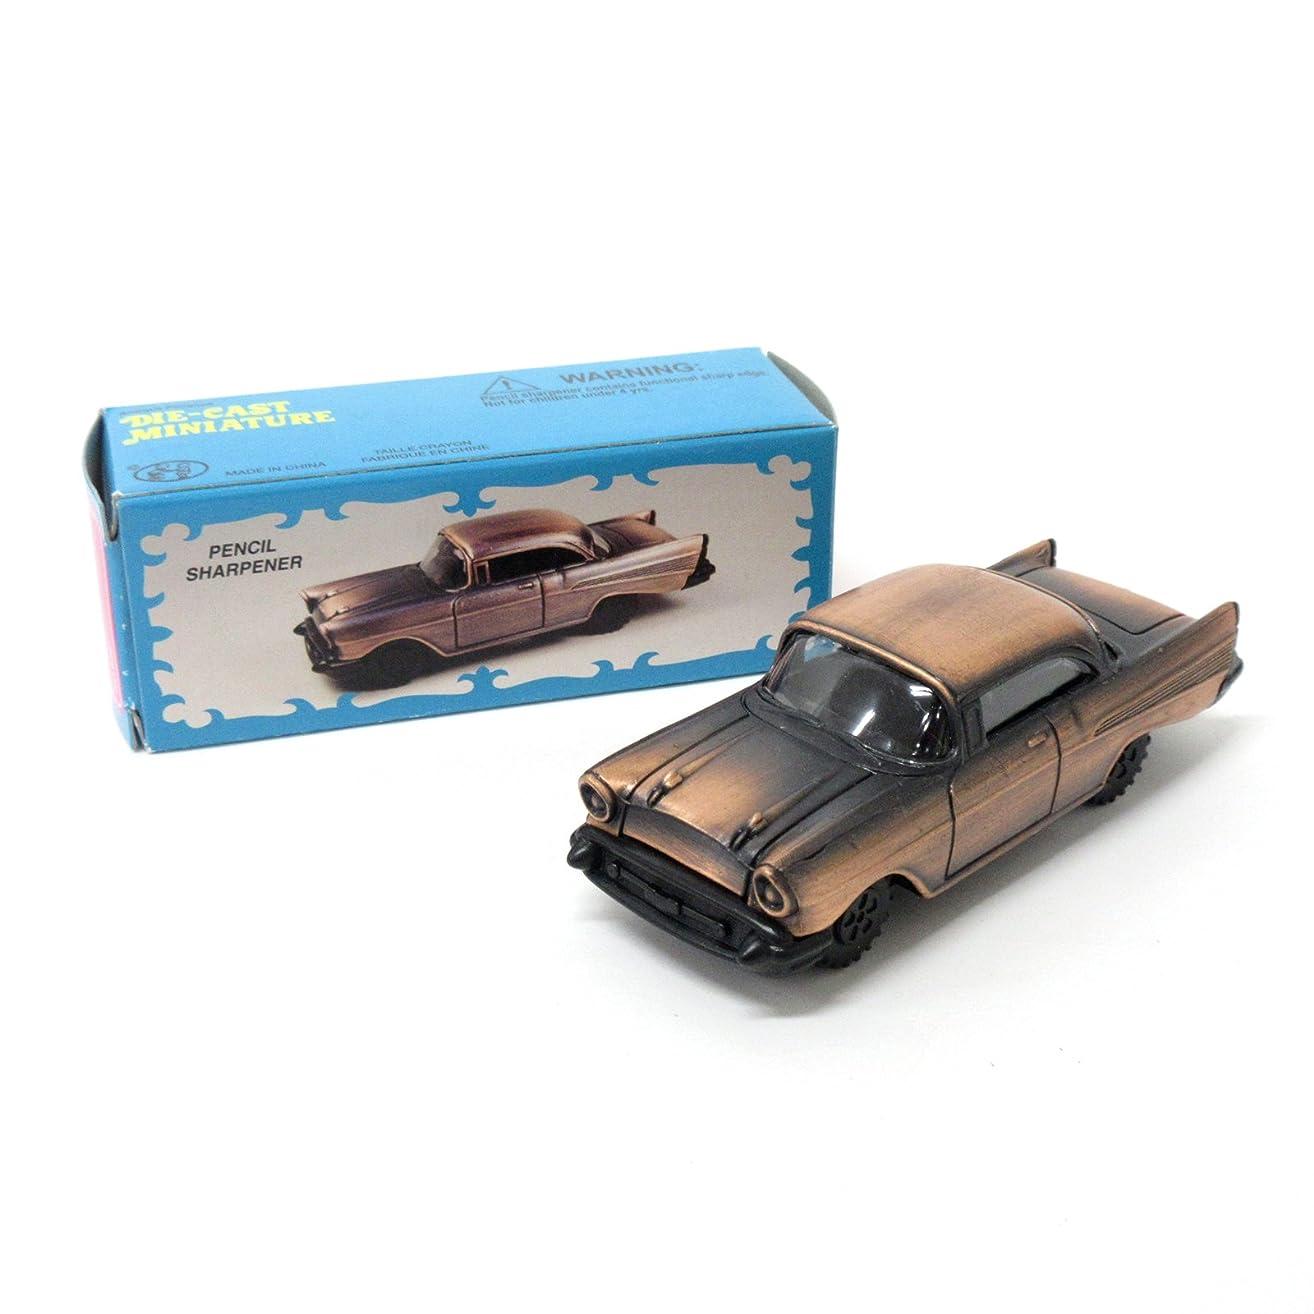 Antique Miniature GT Car Die Cast Collectible Pencil Sharpener gyoiol7999502346